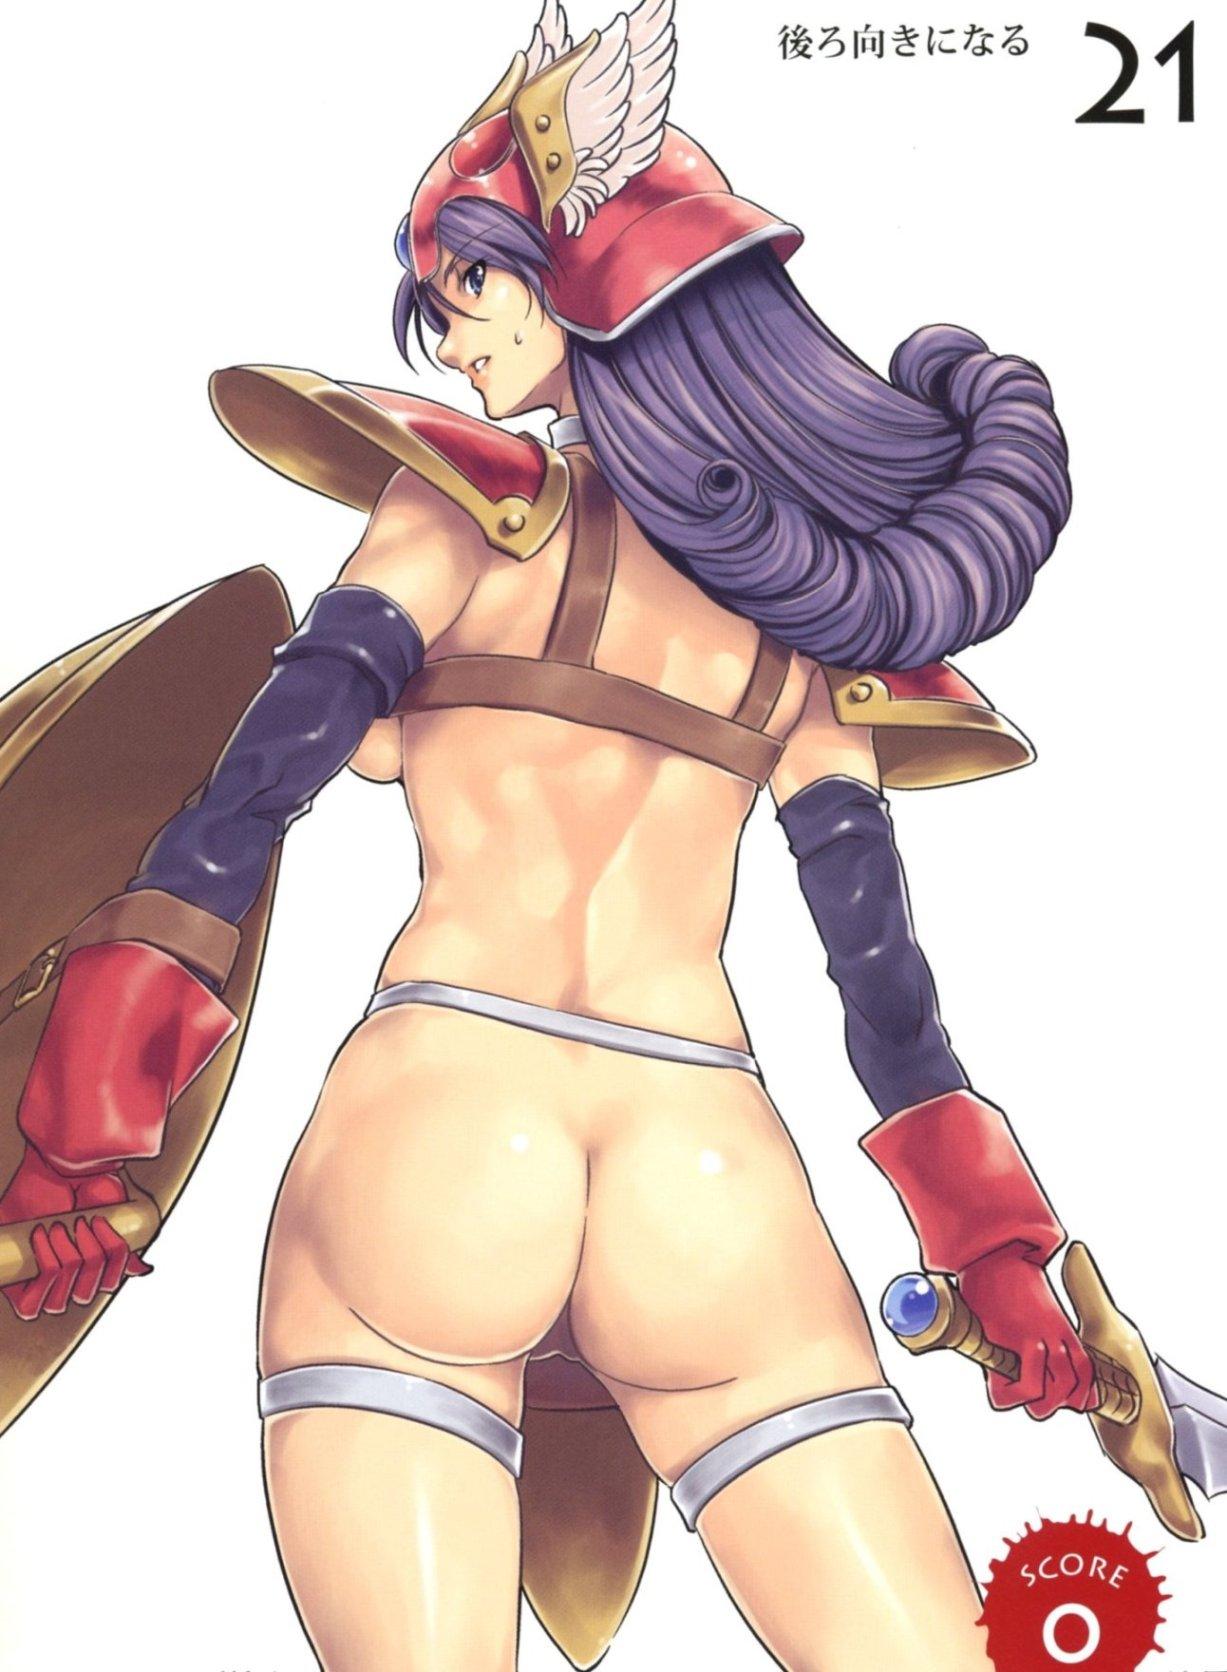 chaos s queen blade spiral Street fighter 4 nude mods